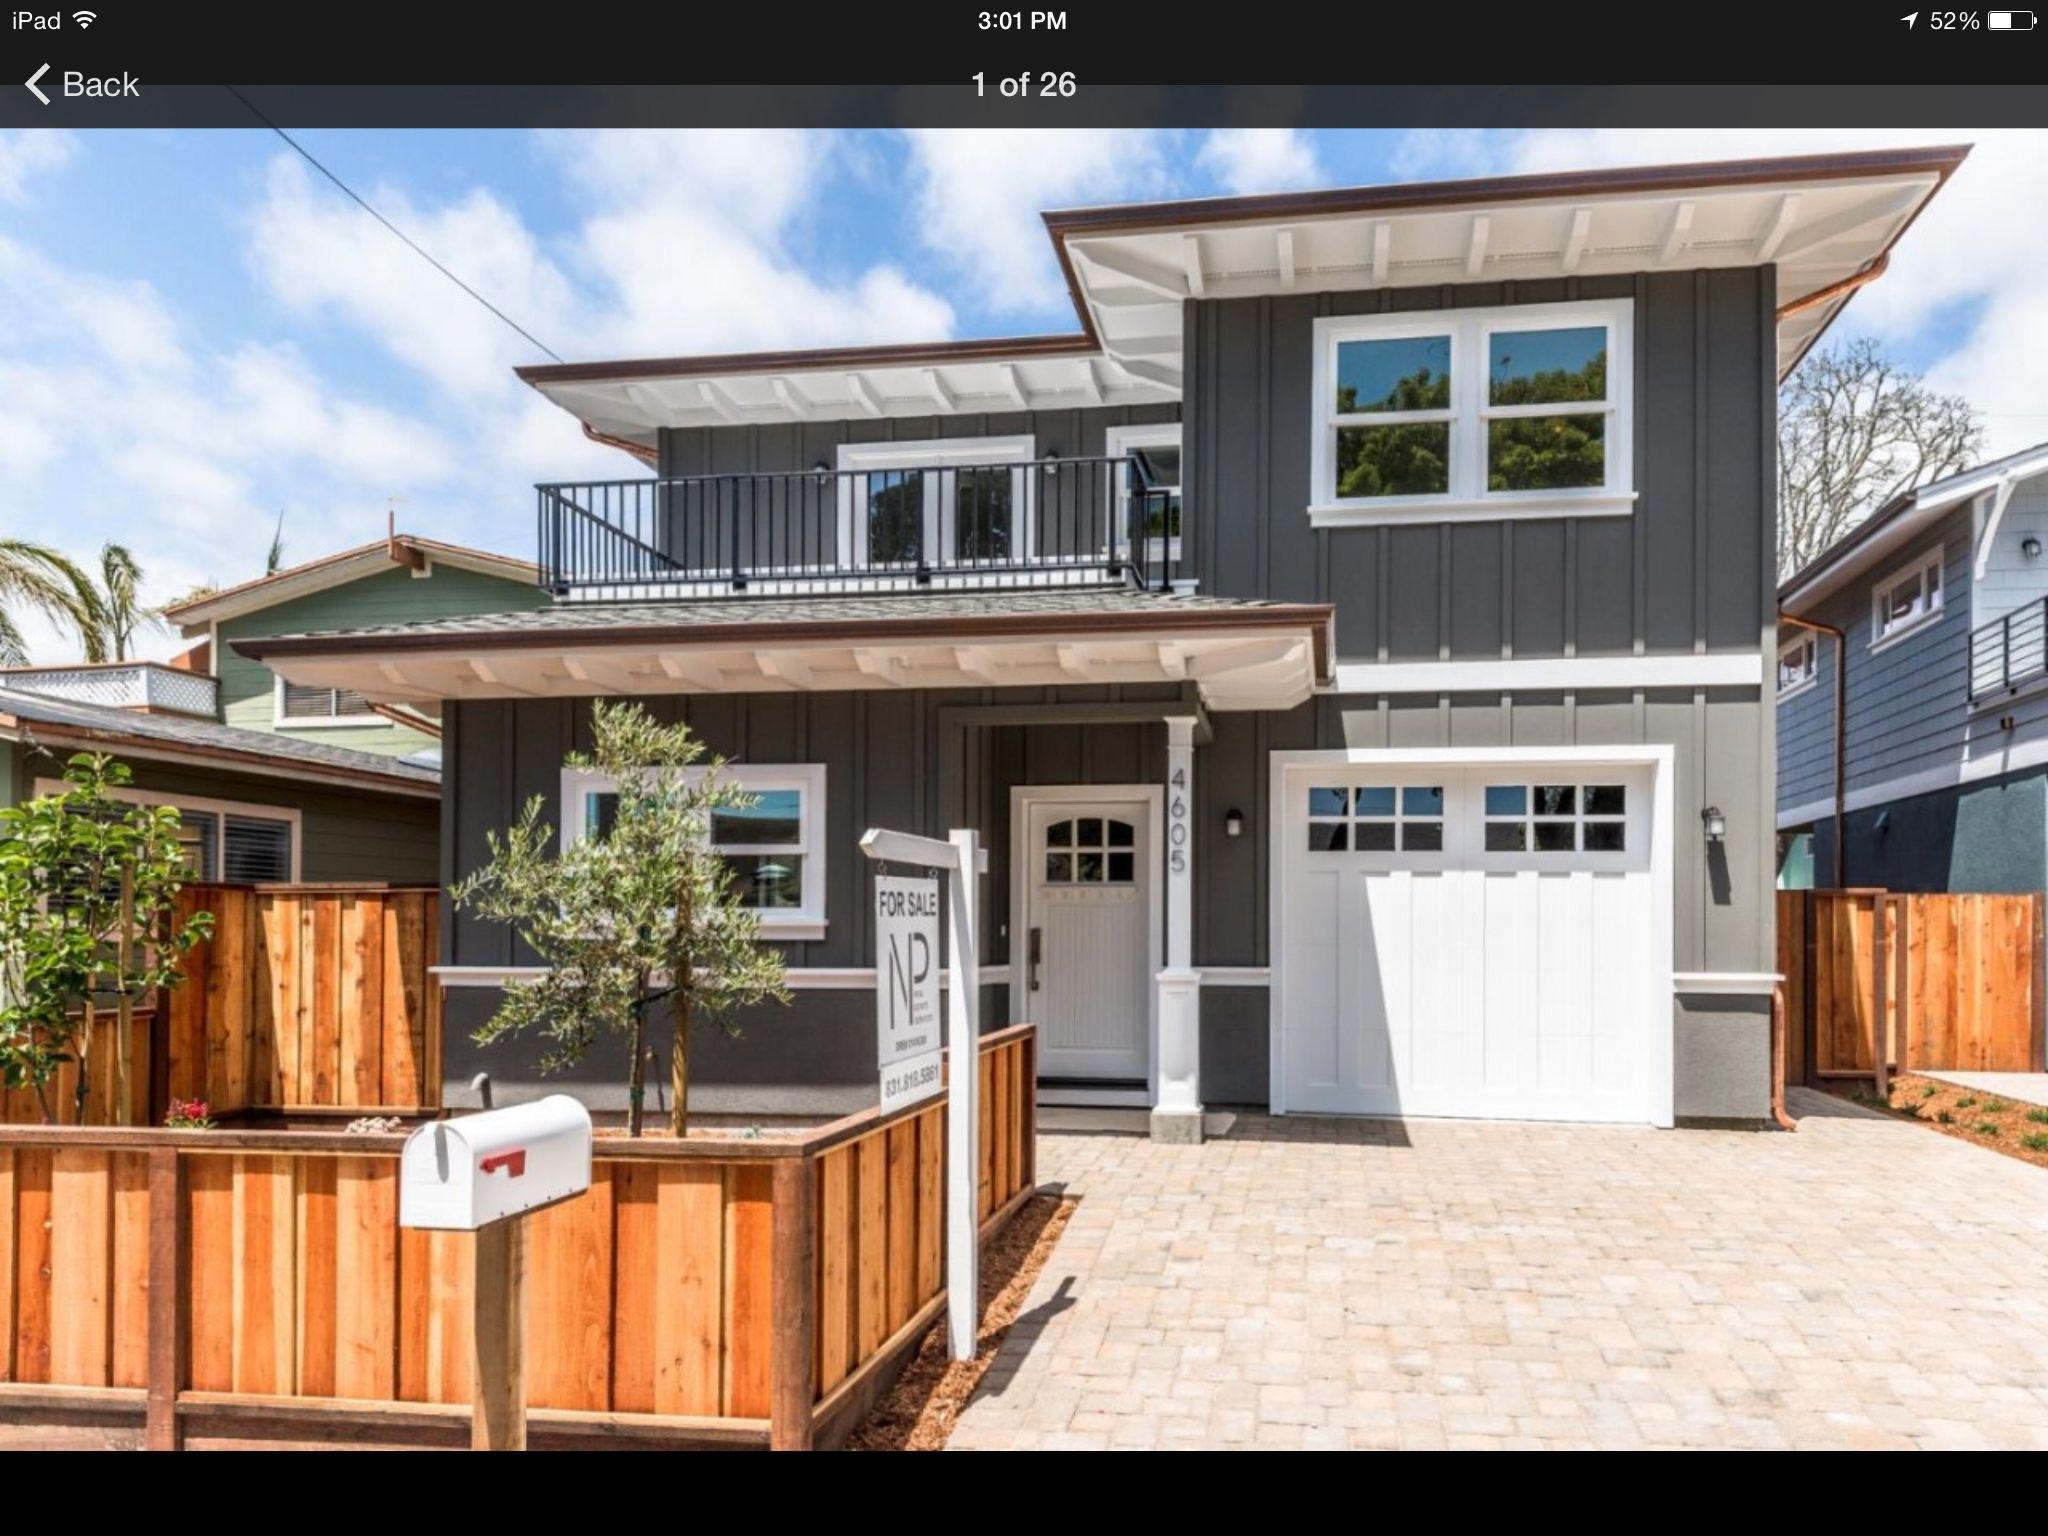 Sullivan Island Beach Home Tour | Coastal decorating ideas! |Beach Cottage Exterior